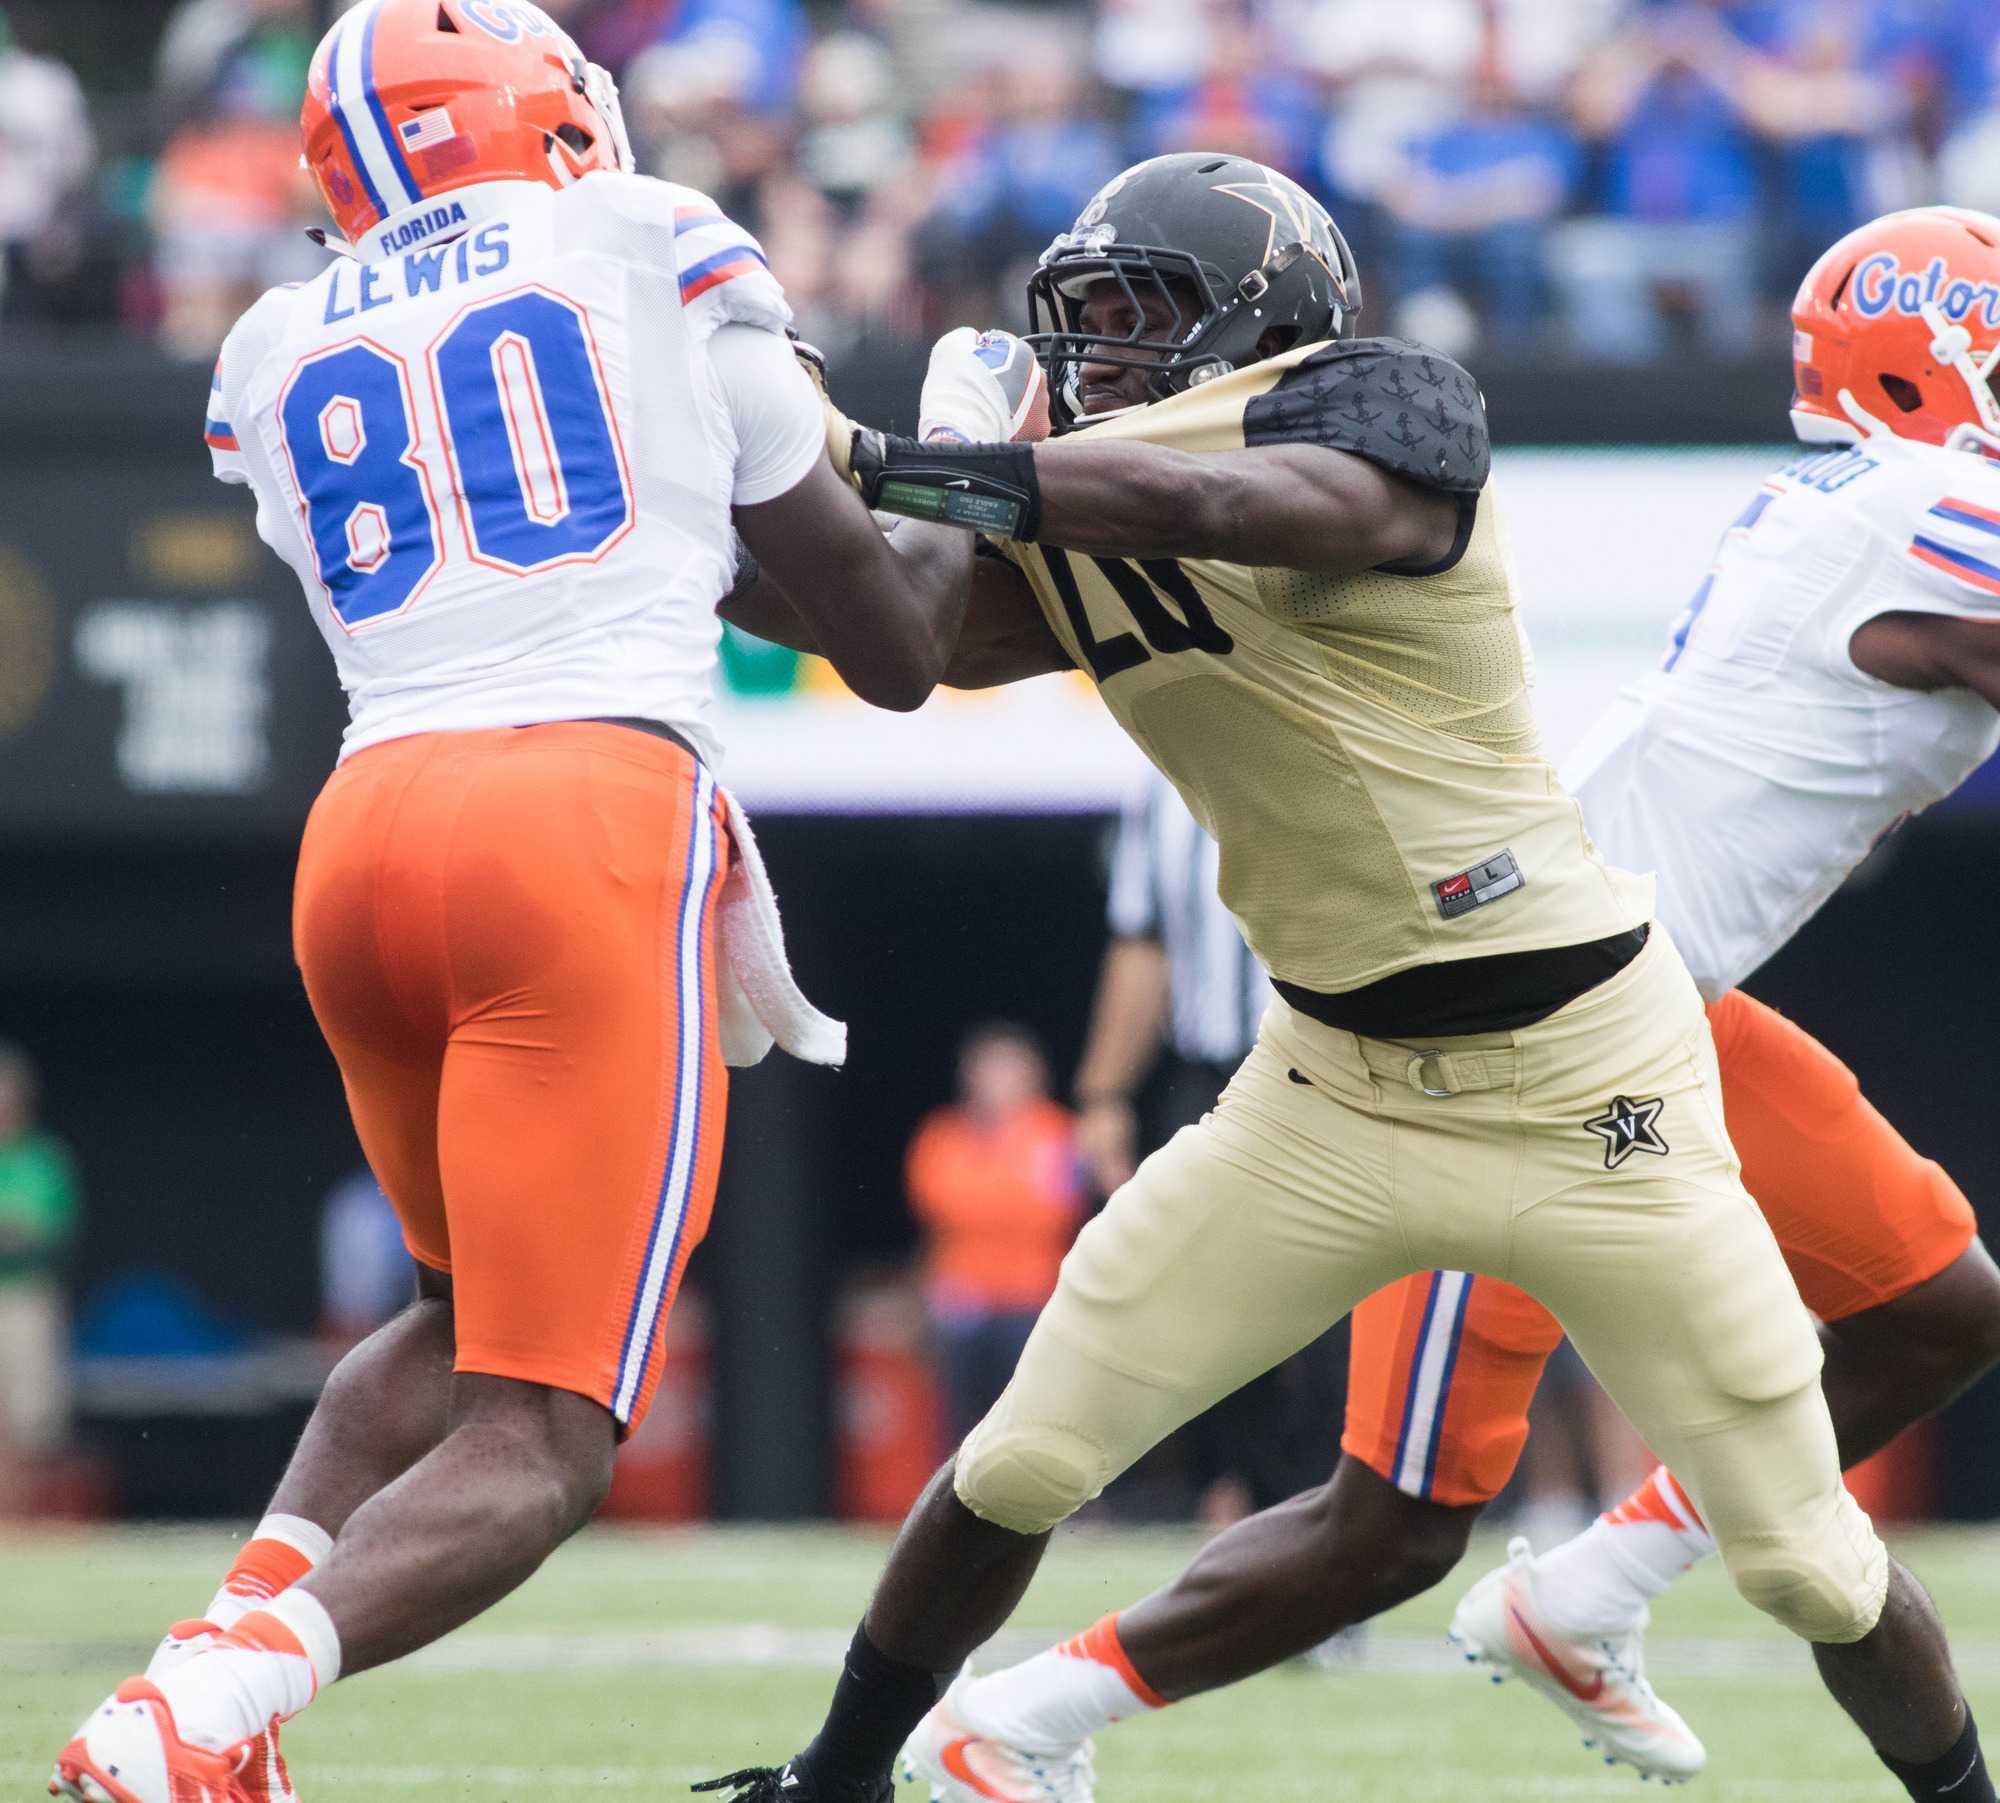 Vanderbilt Lost to University of Florida Gators 13-6 October 1, 2016